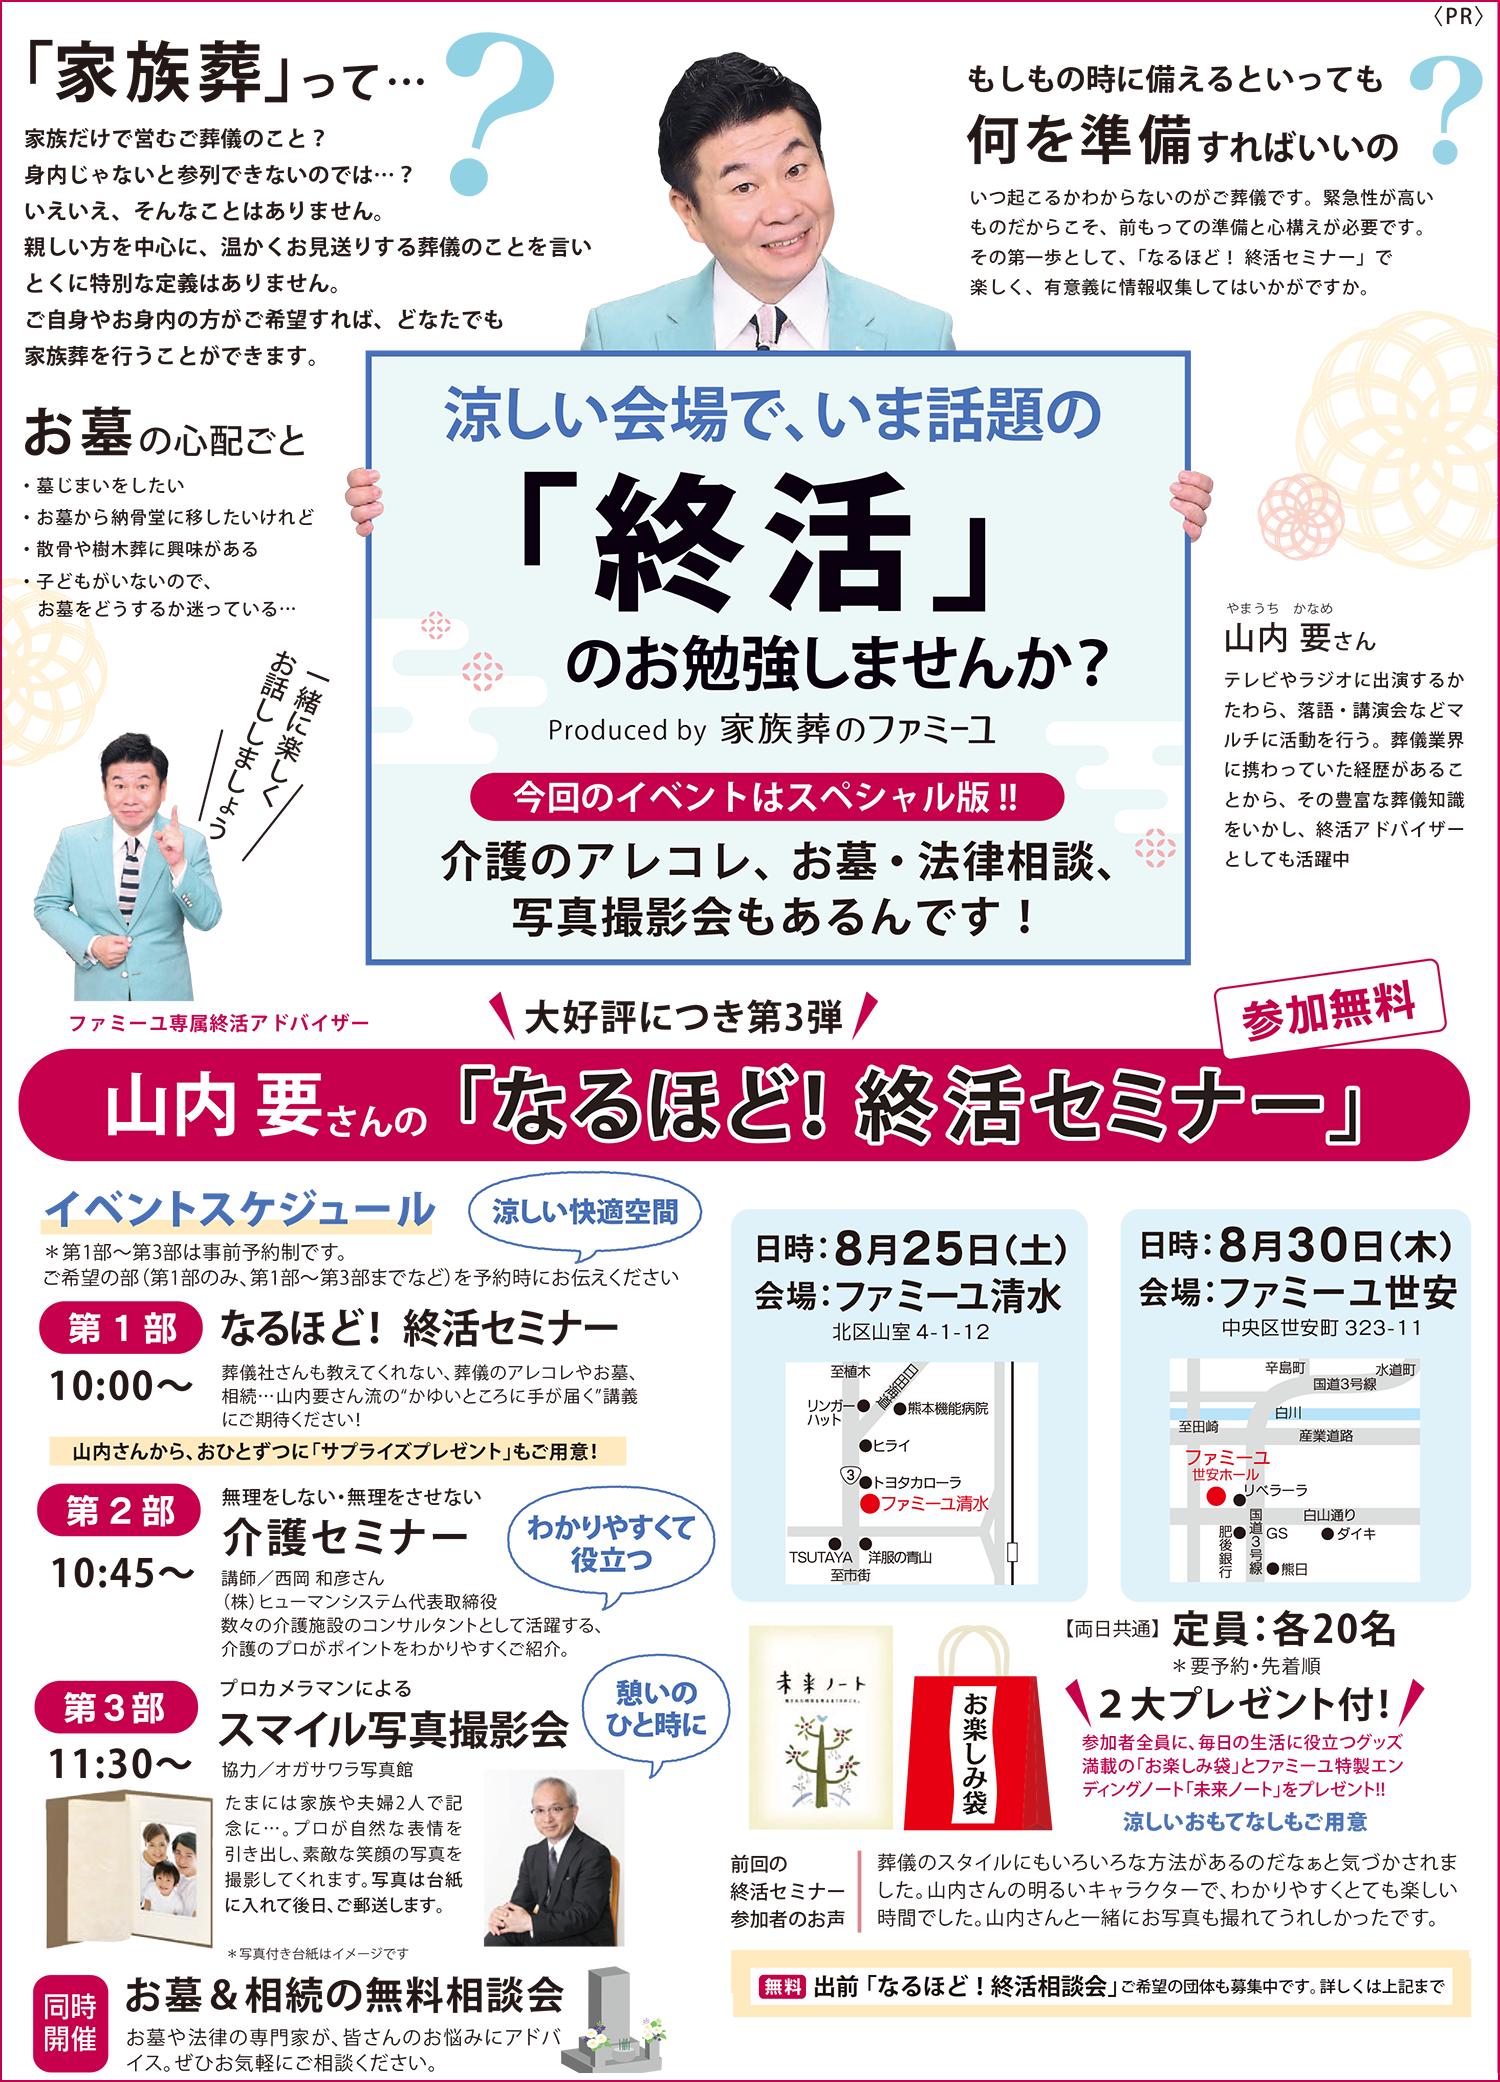 https://www.famille-kazokusou.com/news/6f6035b73e5b9571c496ea7b9307cb3f3f6ed78b.png